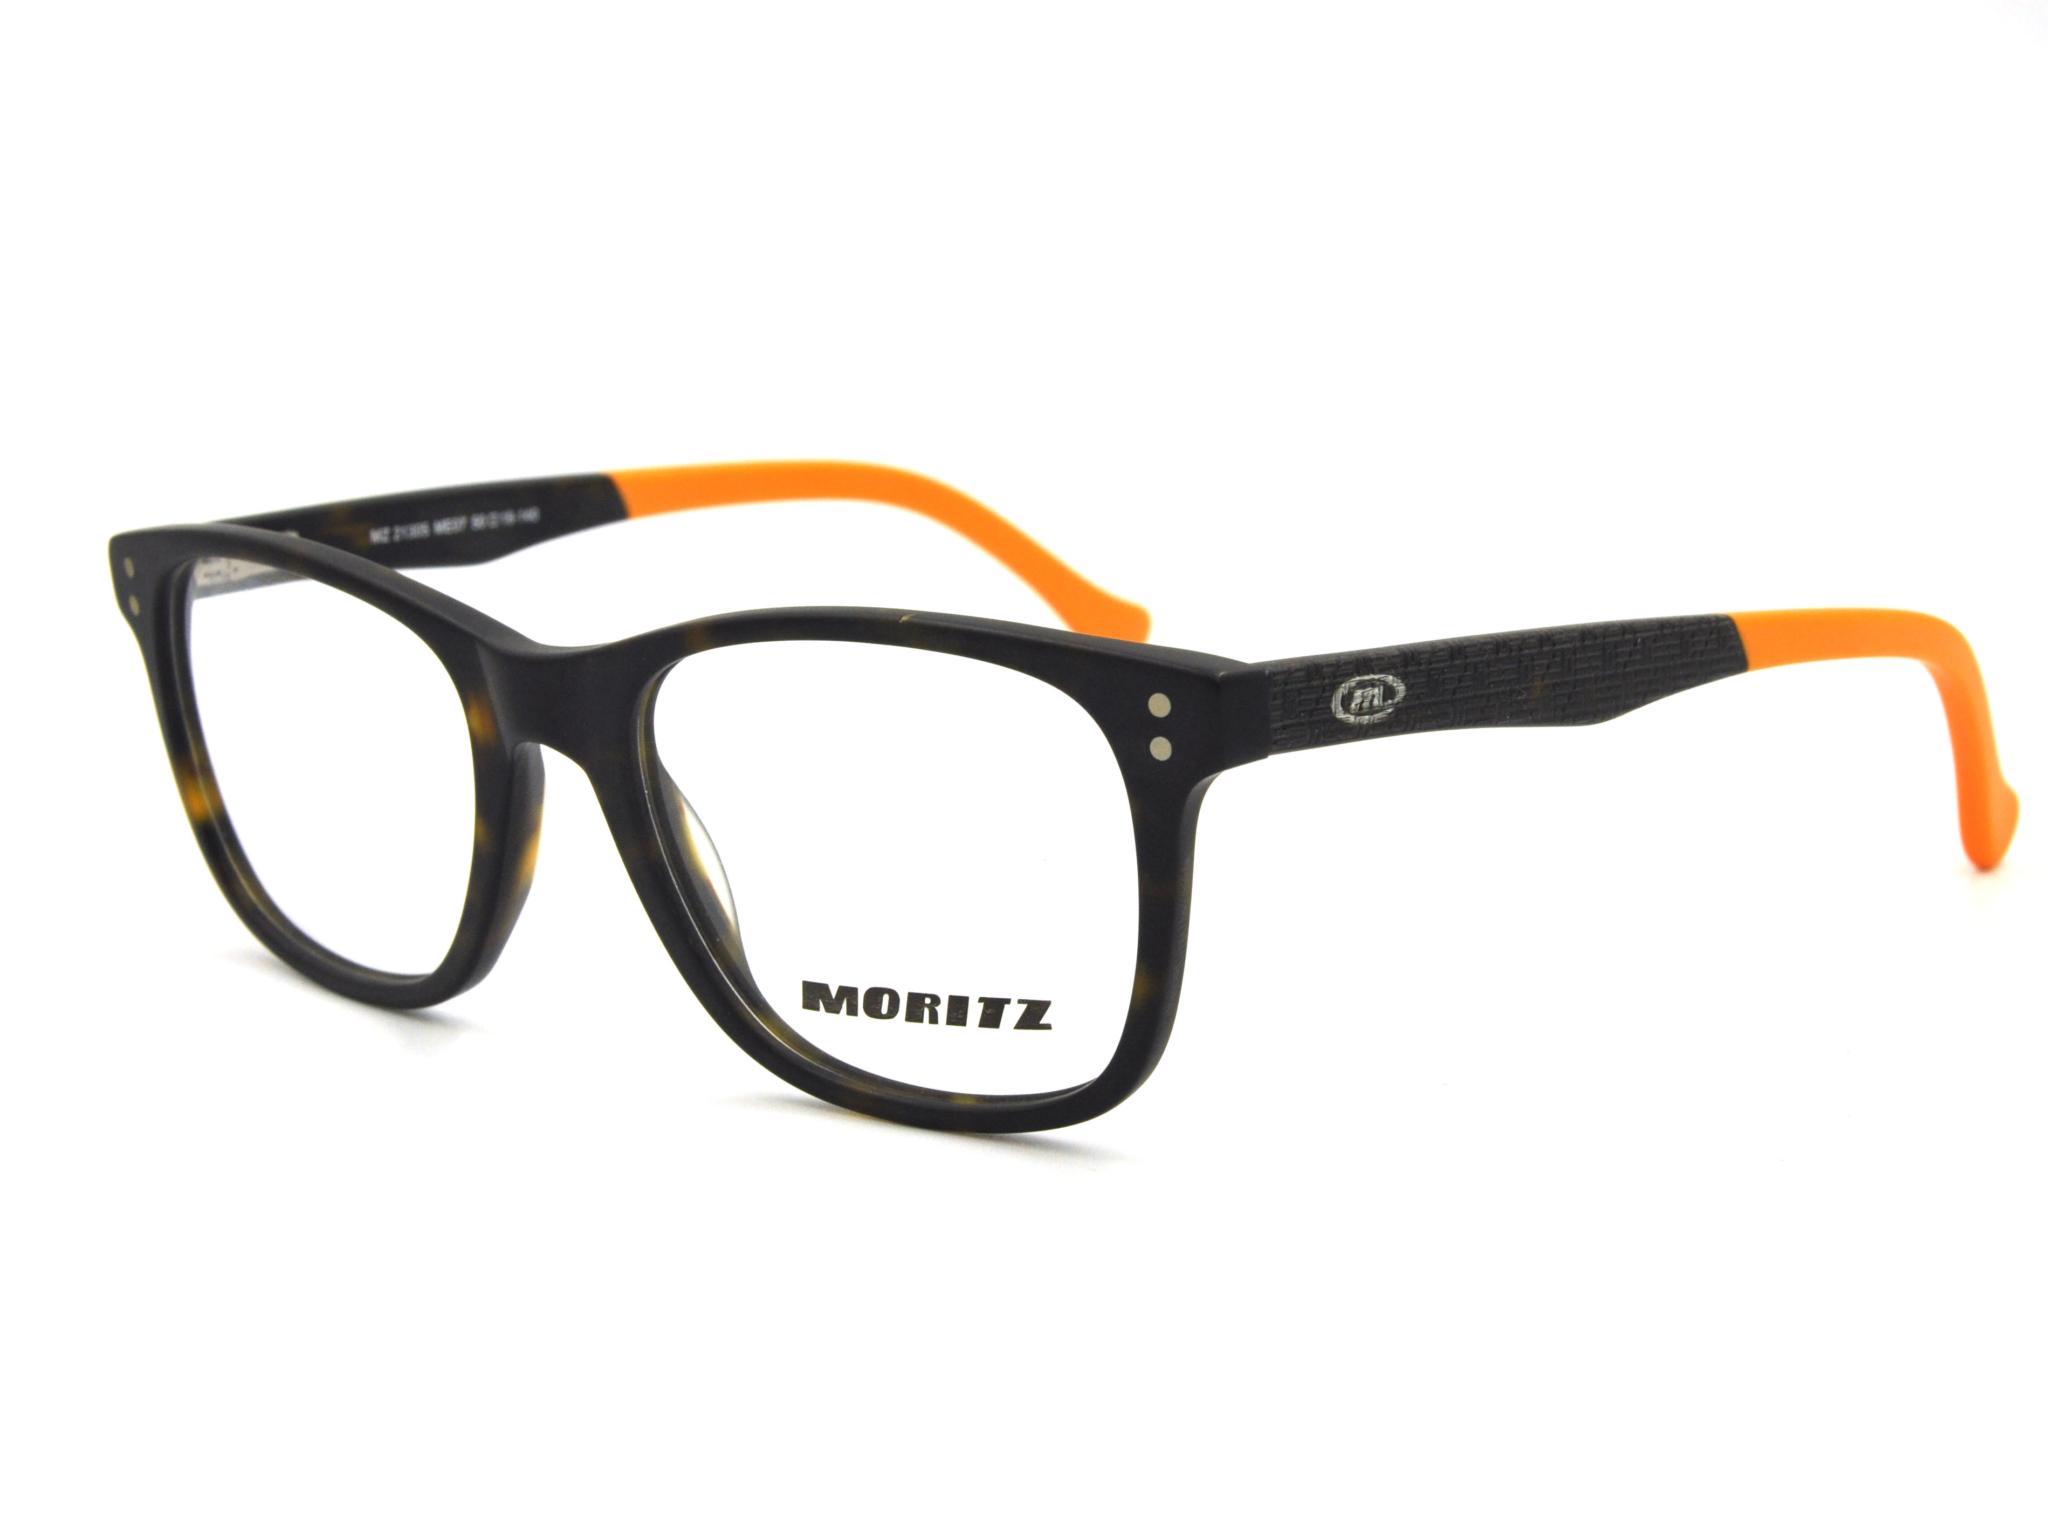 MORITZ MZ21305 ME07 Prescription Glasses 2020